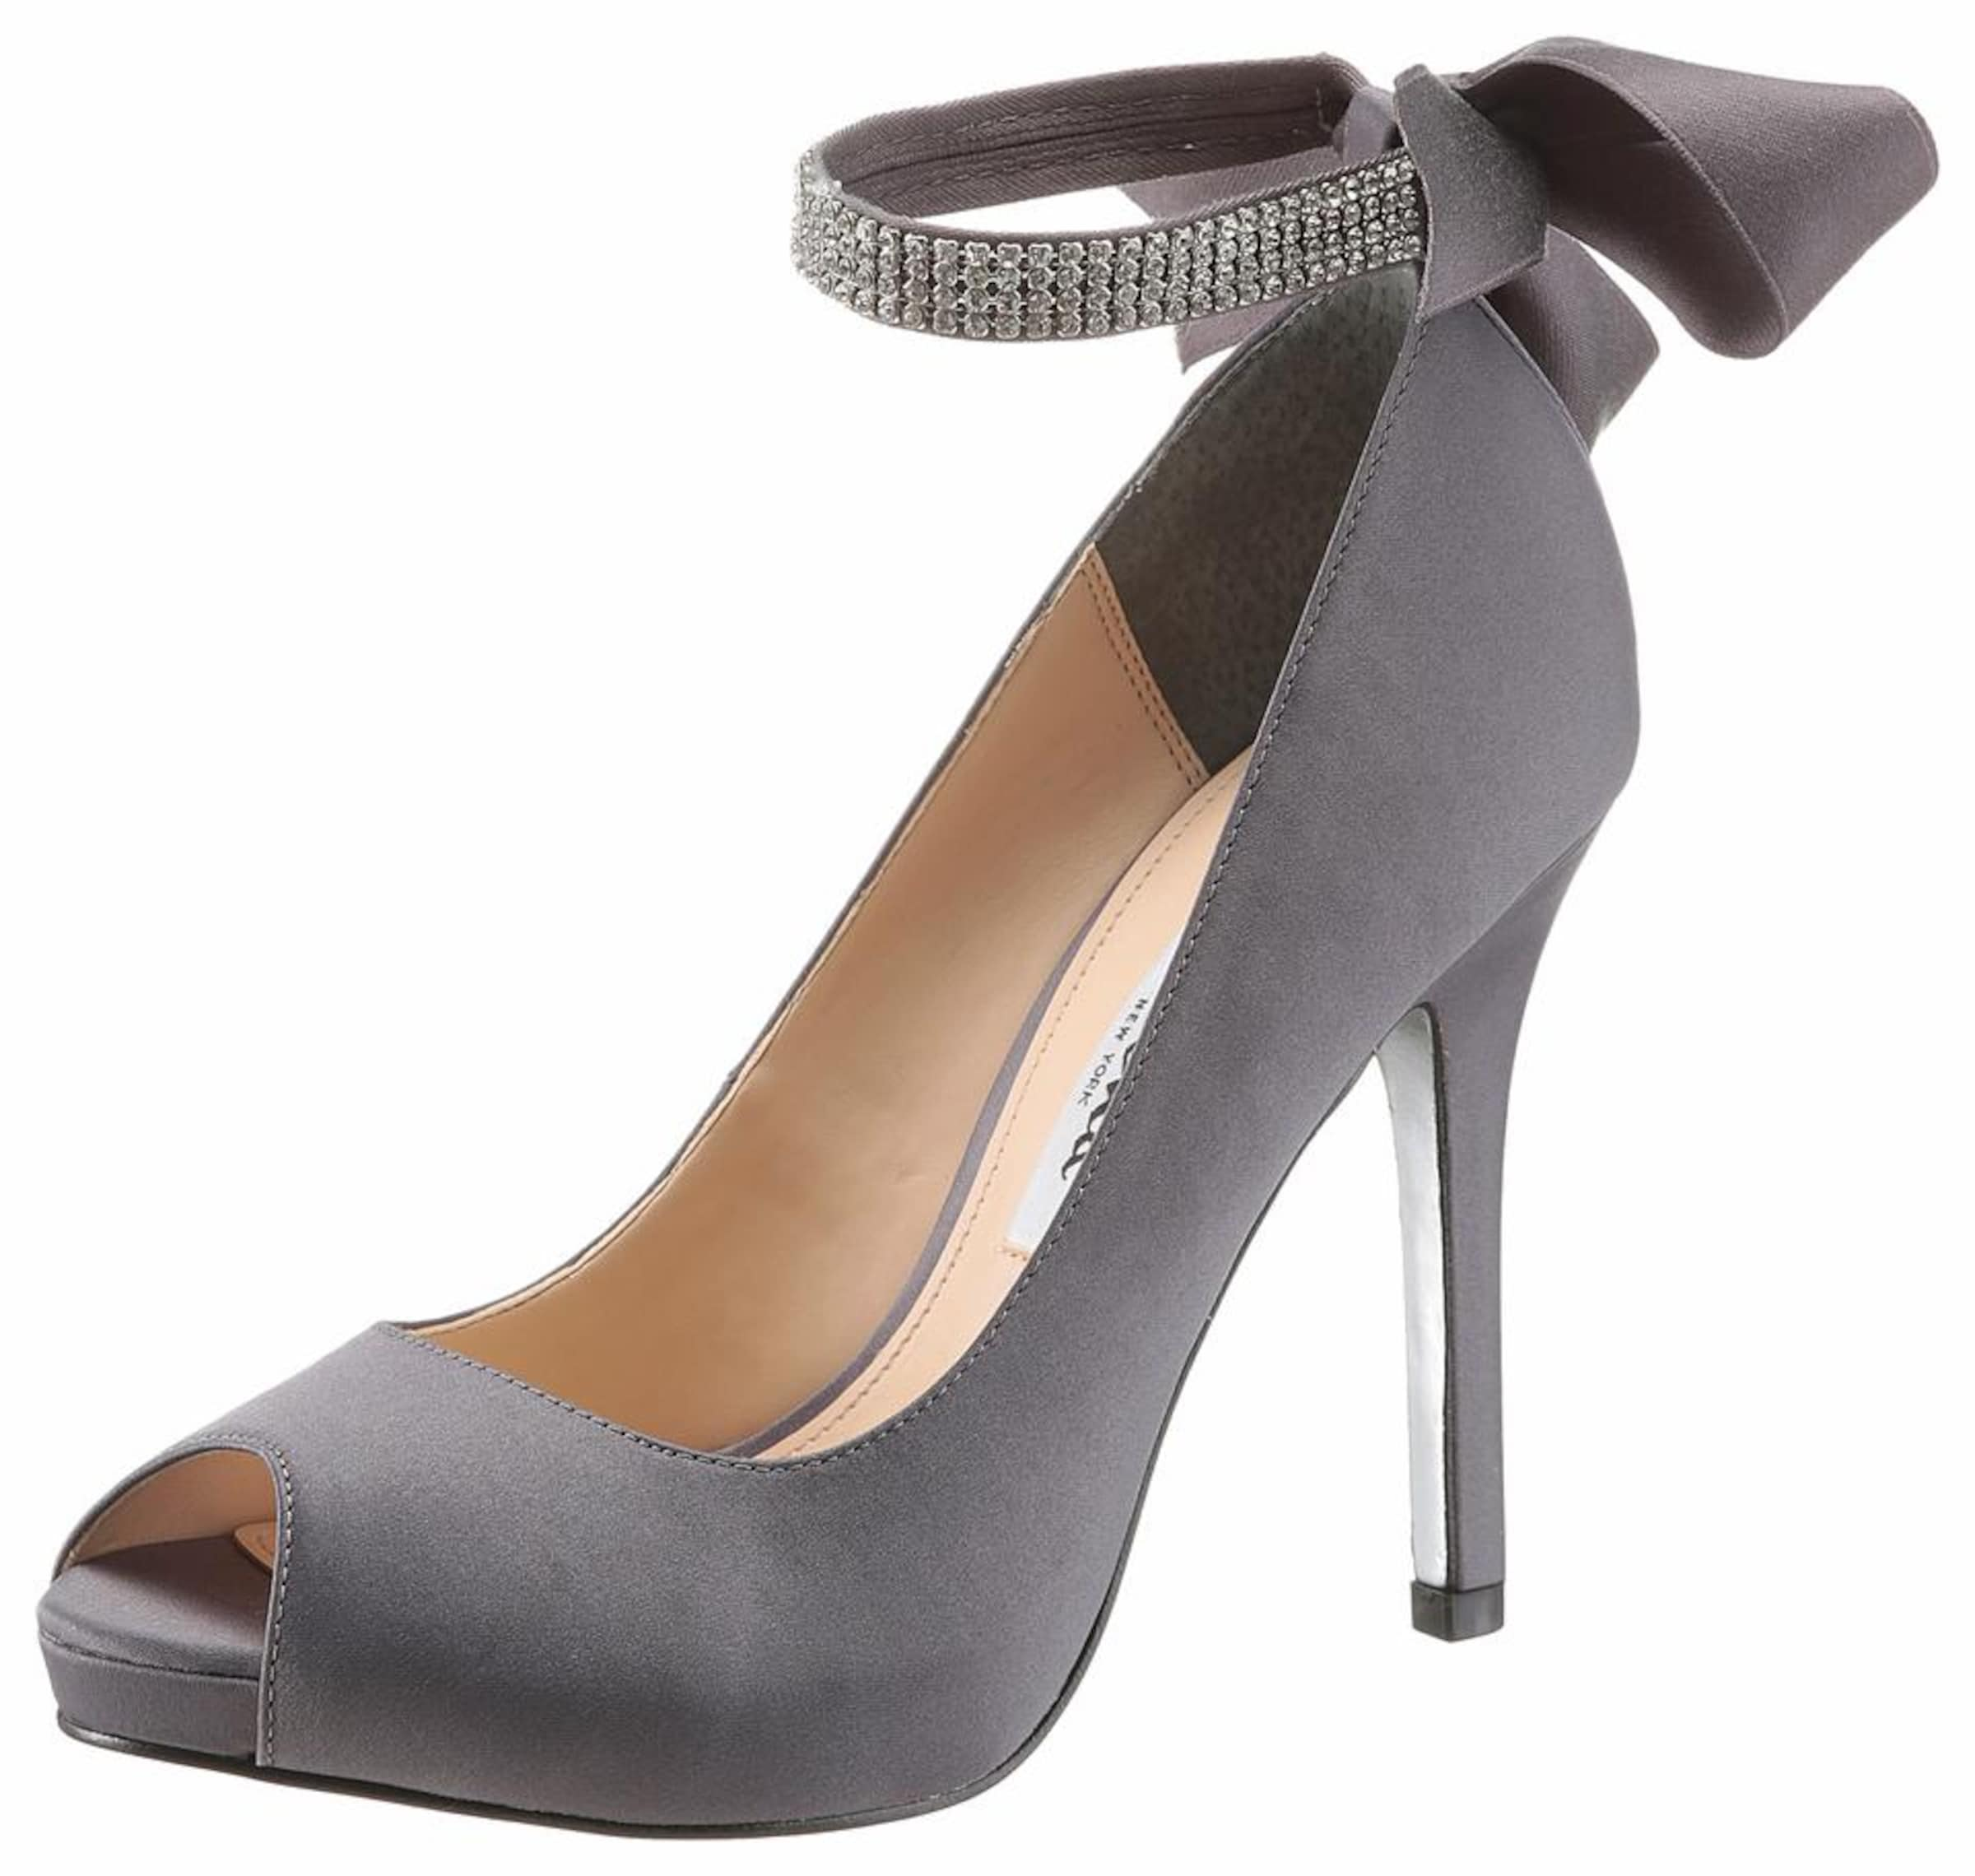 RARE Nina Peeptoepumps Günstige und langlebige Schuhe